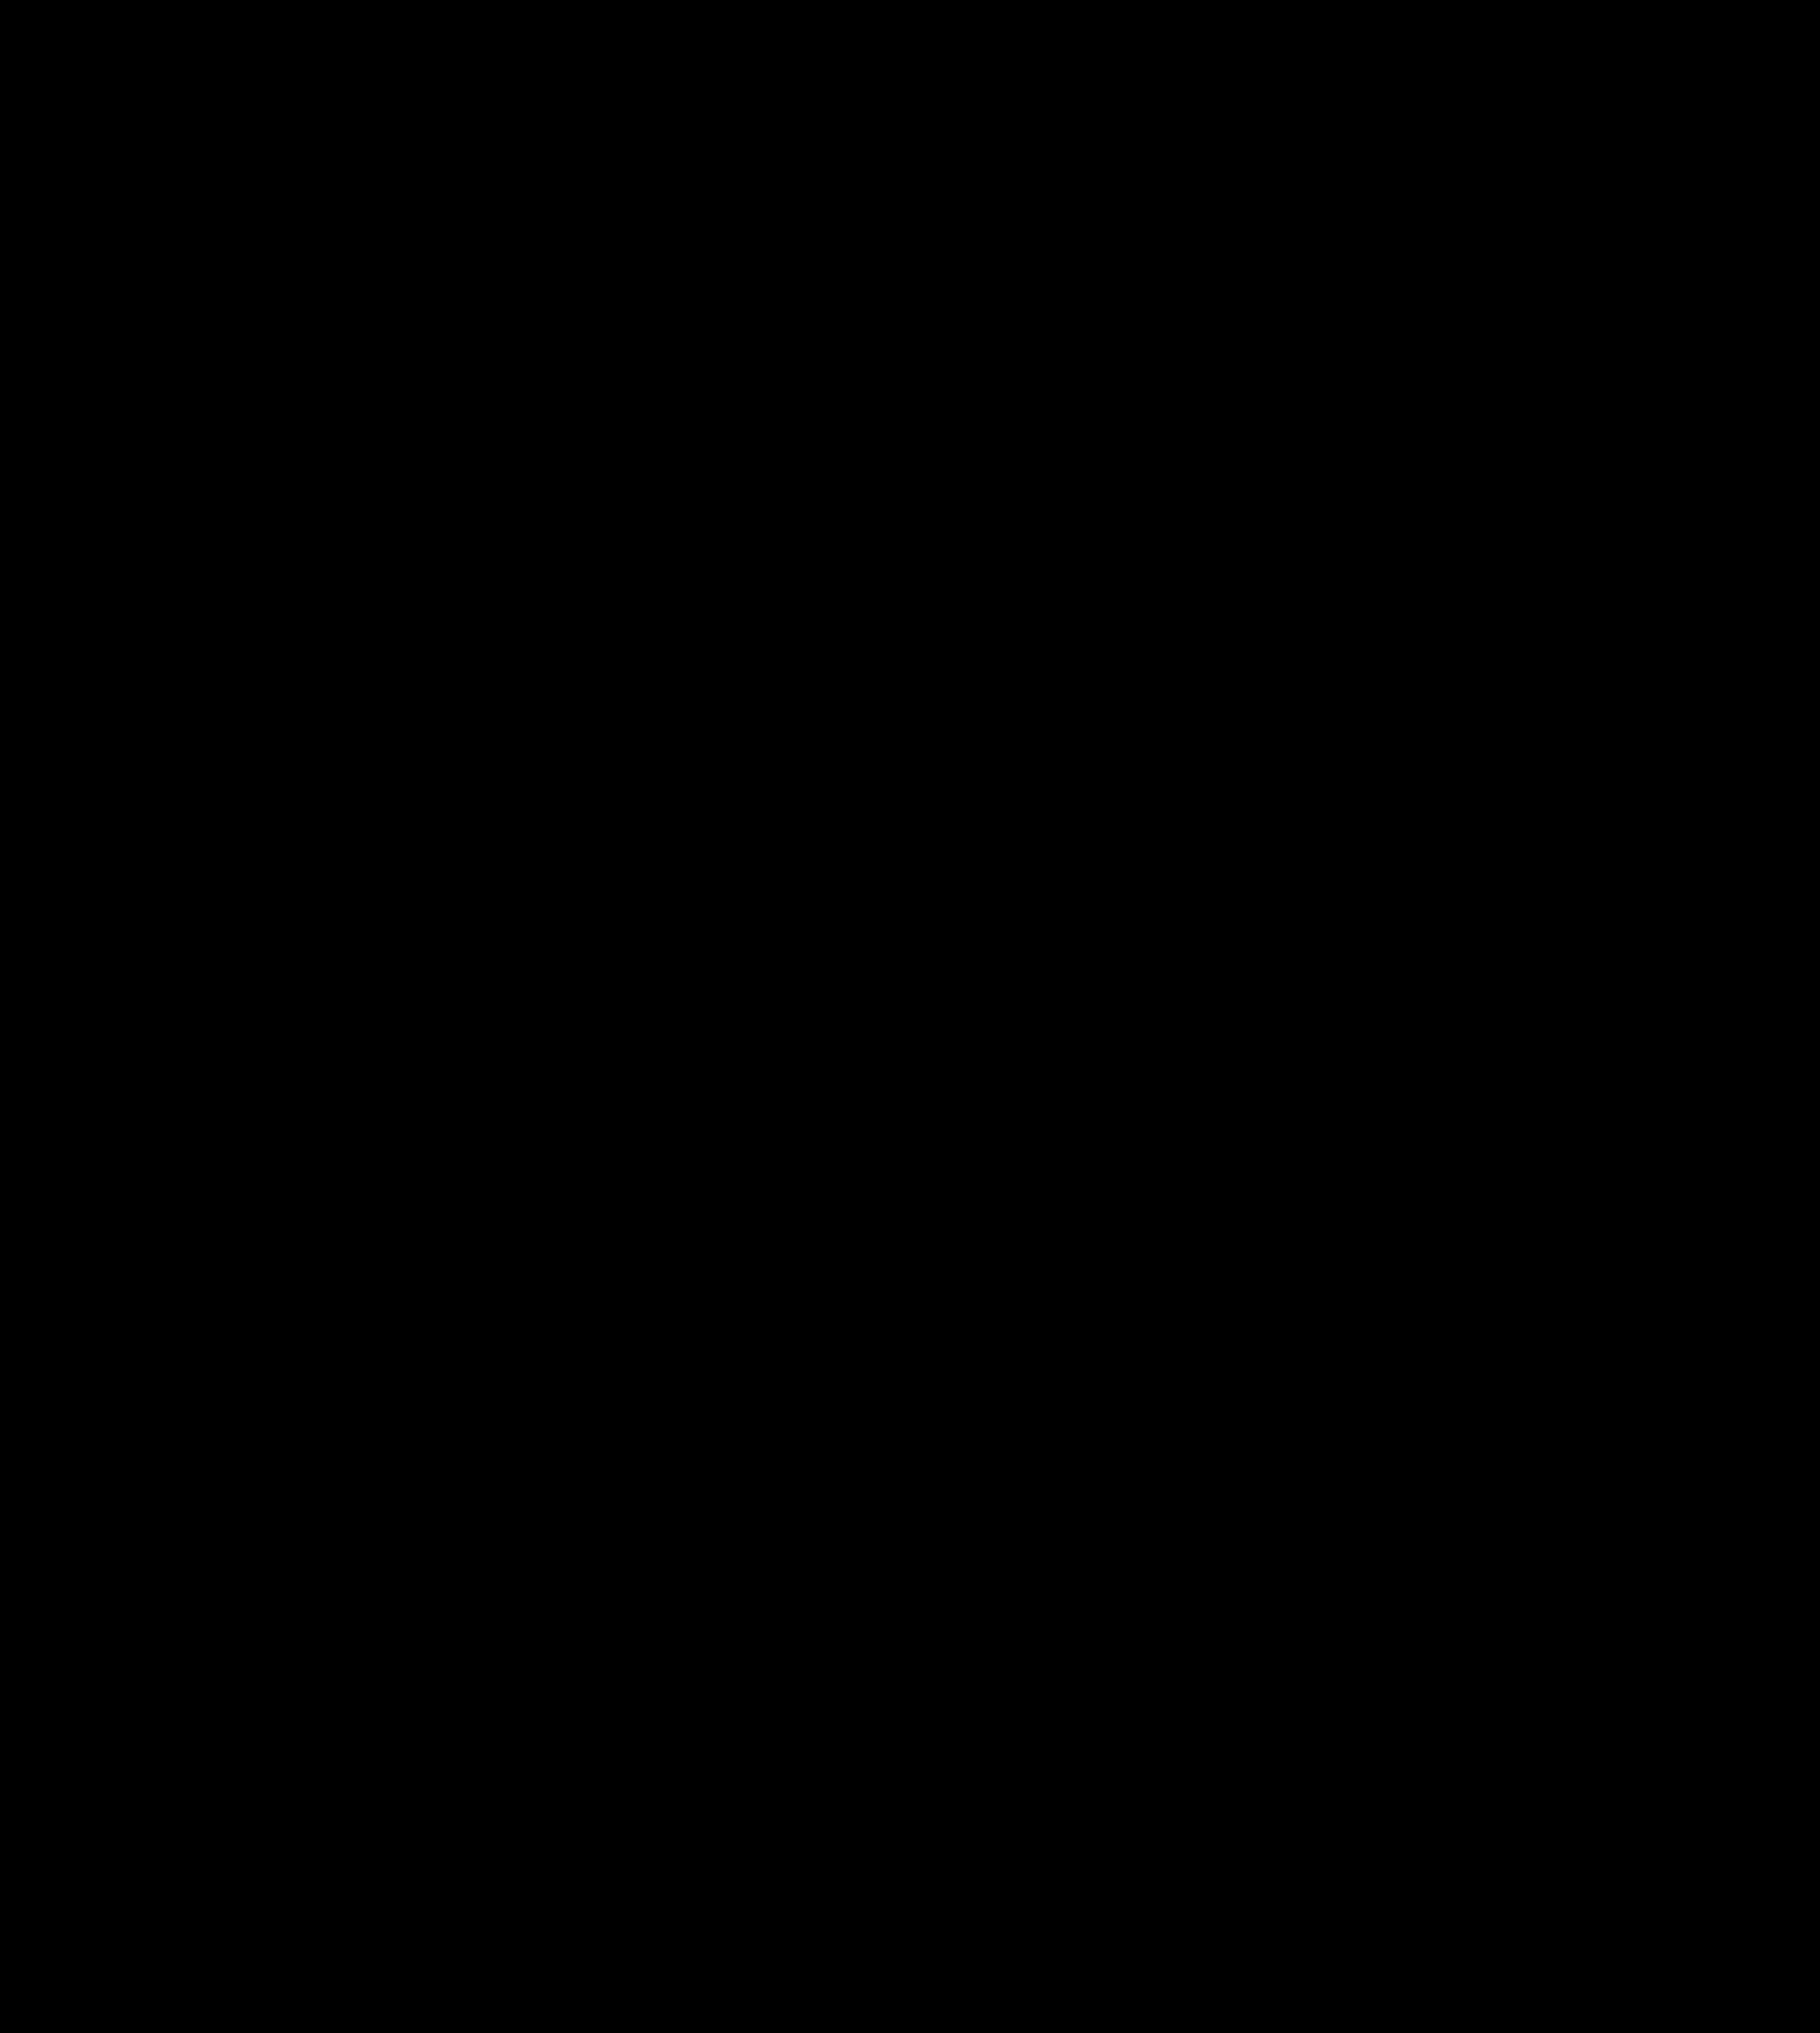 Horn pattern big image. Clipart unicorn template